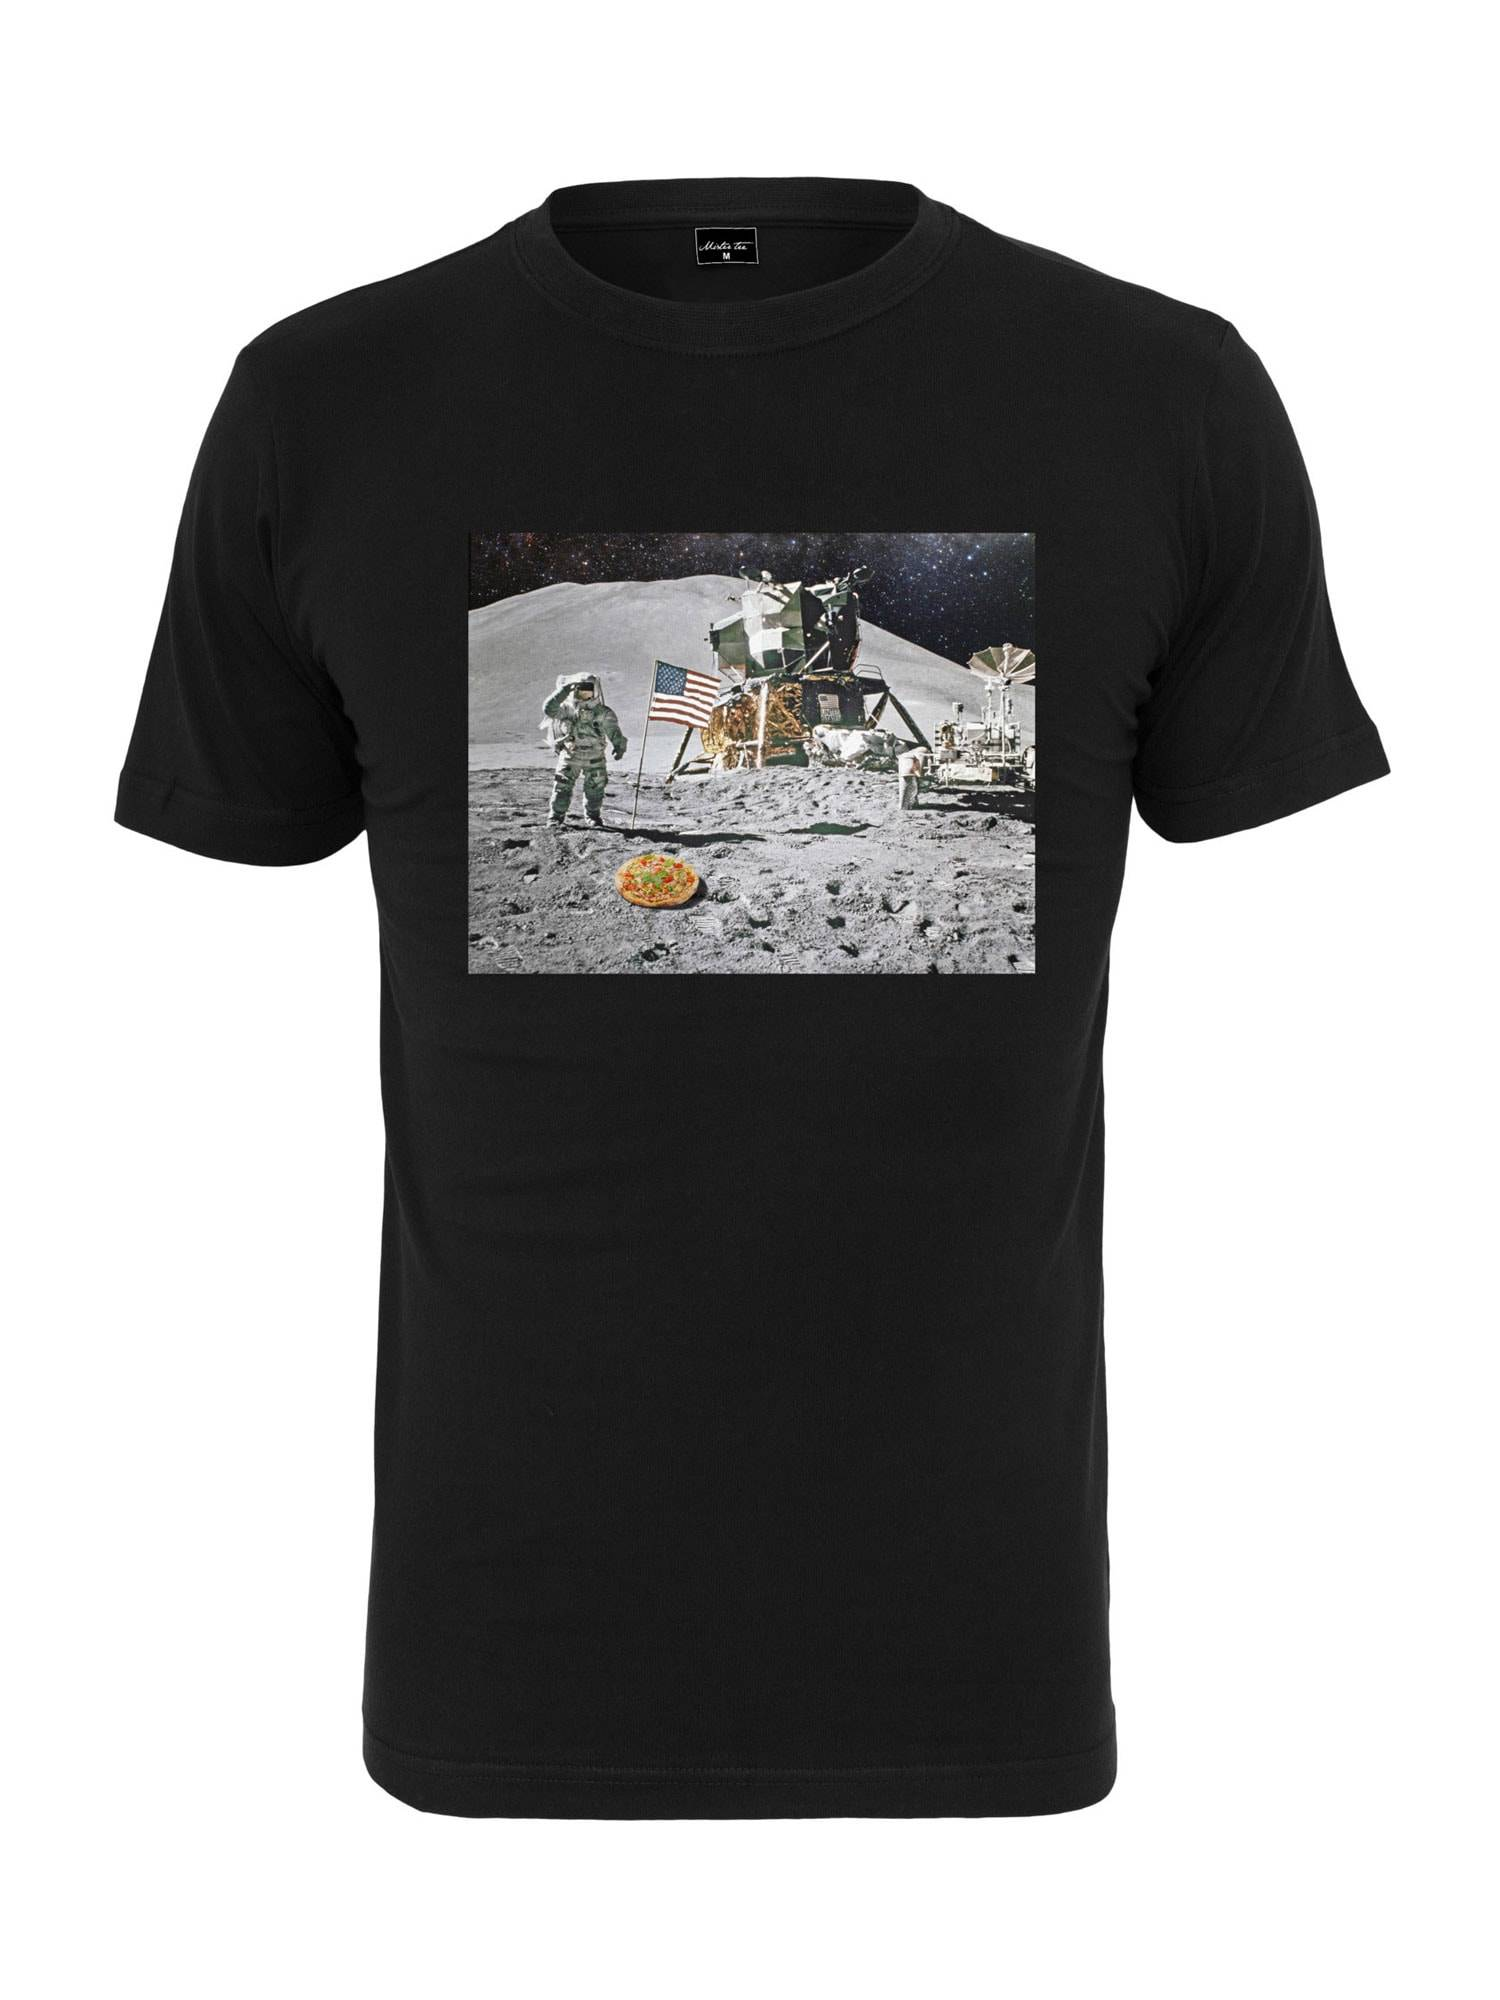 Tee T-Shirt 'Pizza Moon Landing'  - Noir - Taille: XL - male